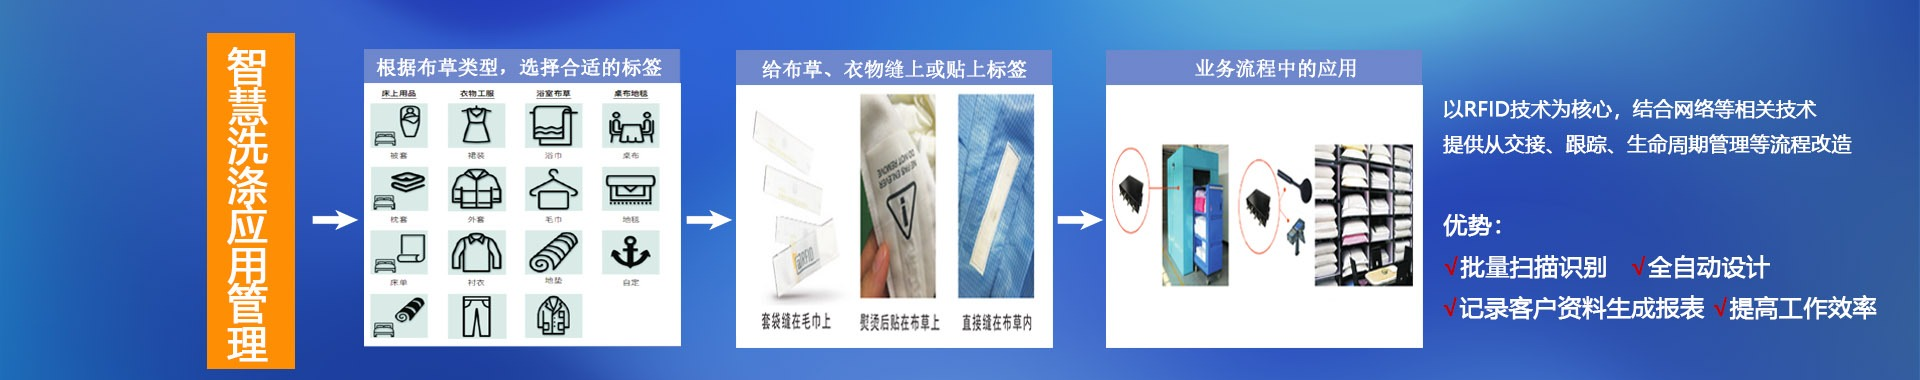 RFID资产管理